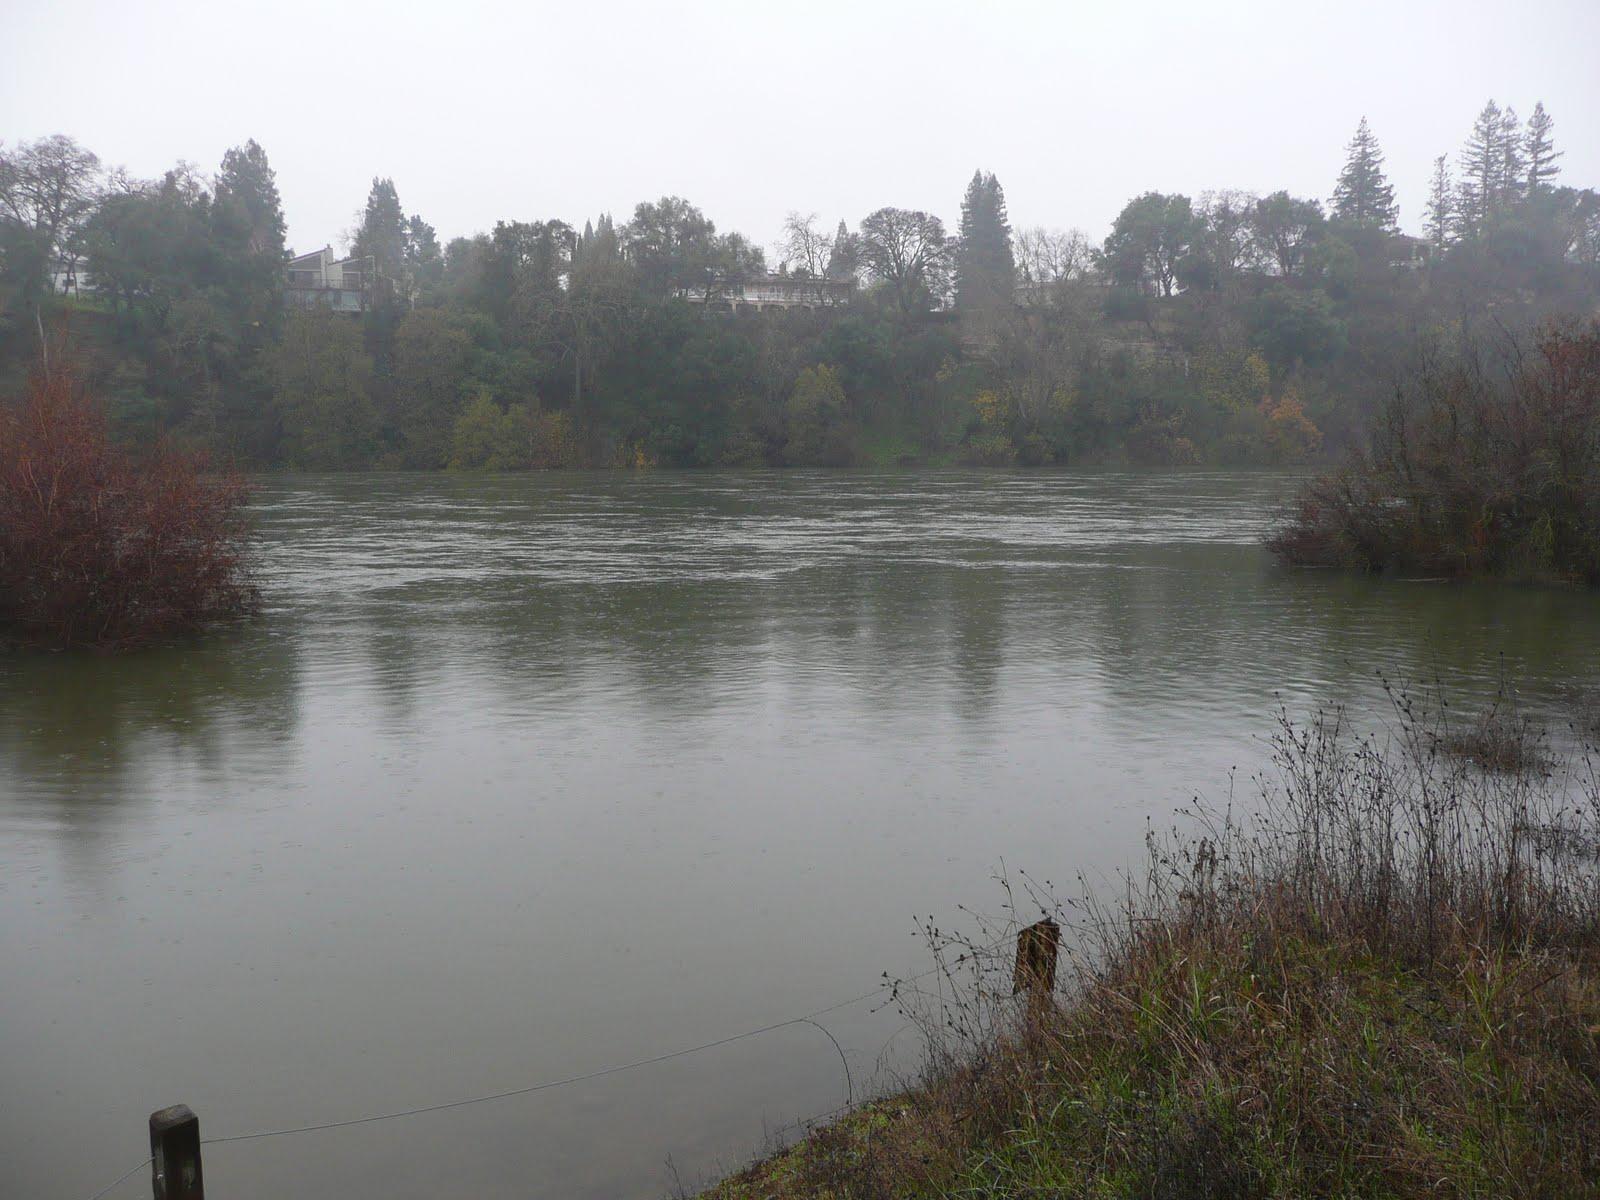 Northern california trout december 2010 for Lake natoma fishing